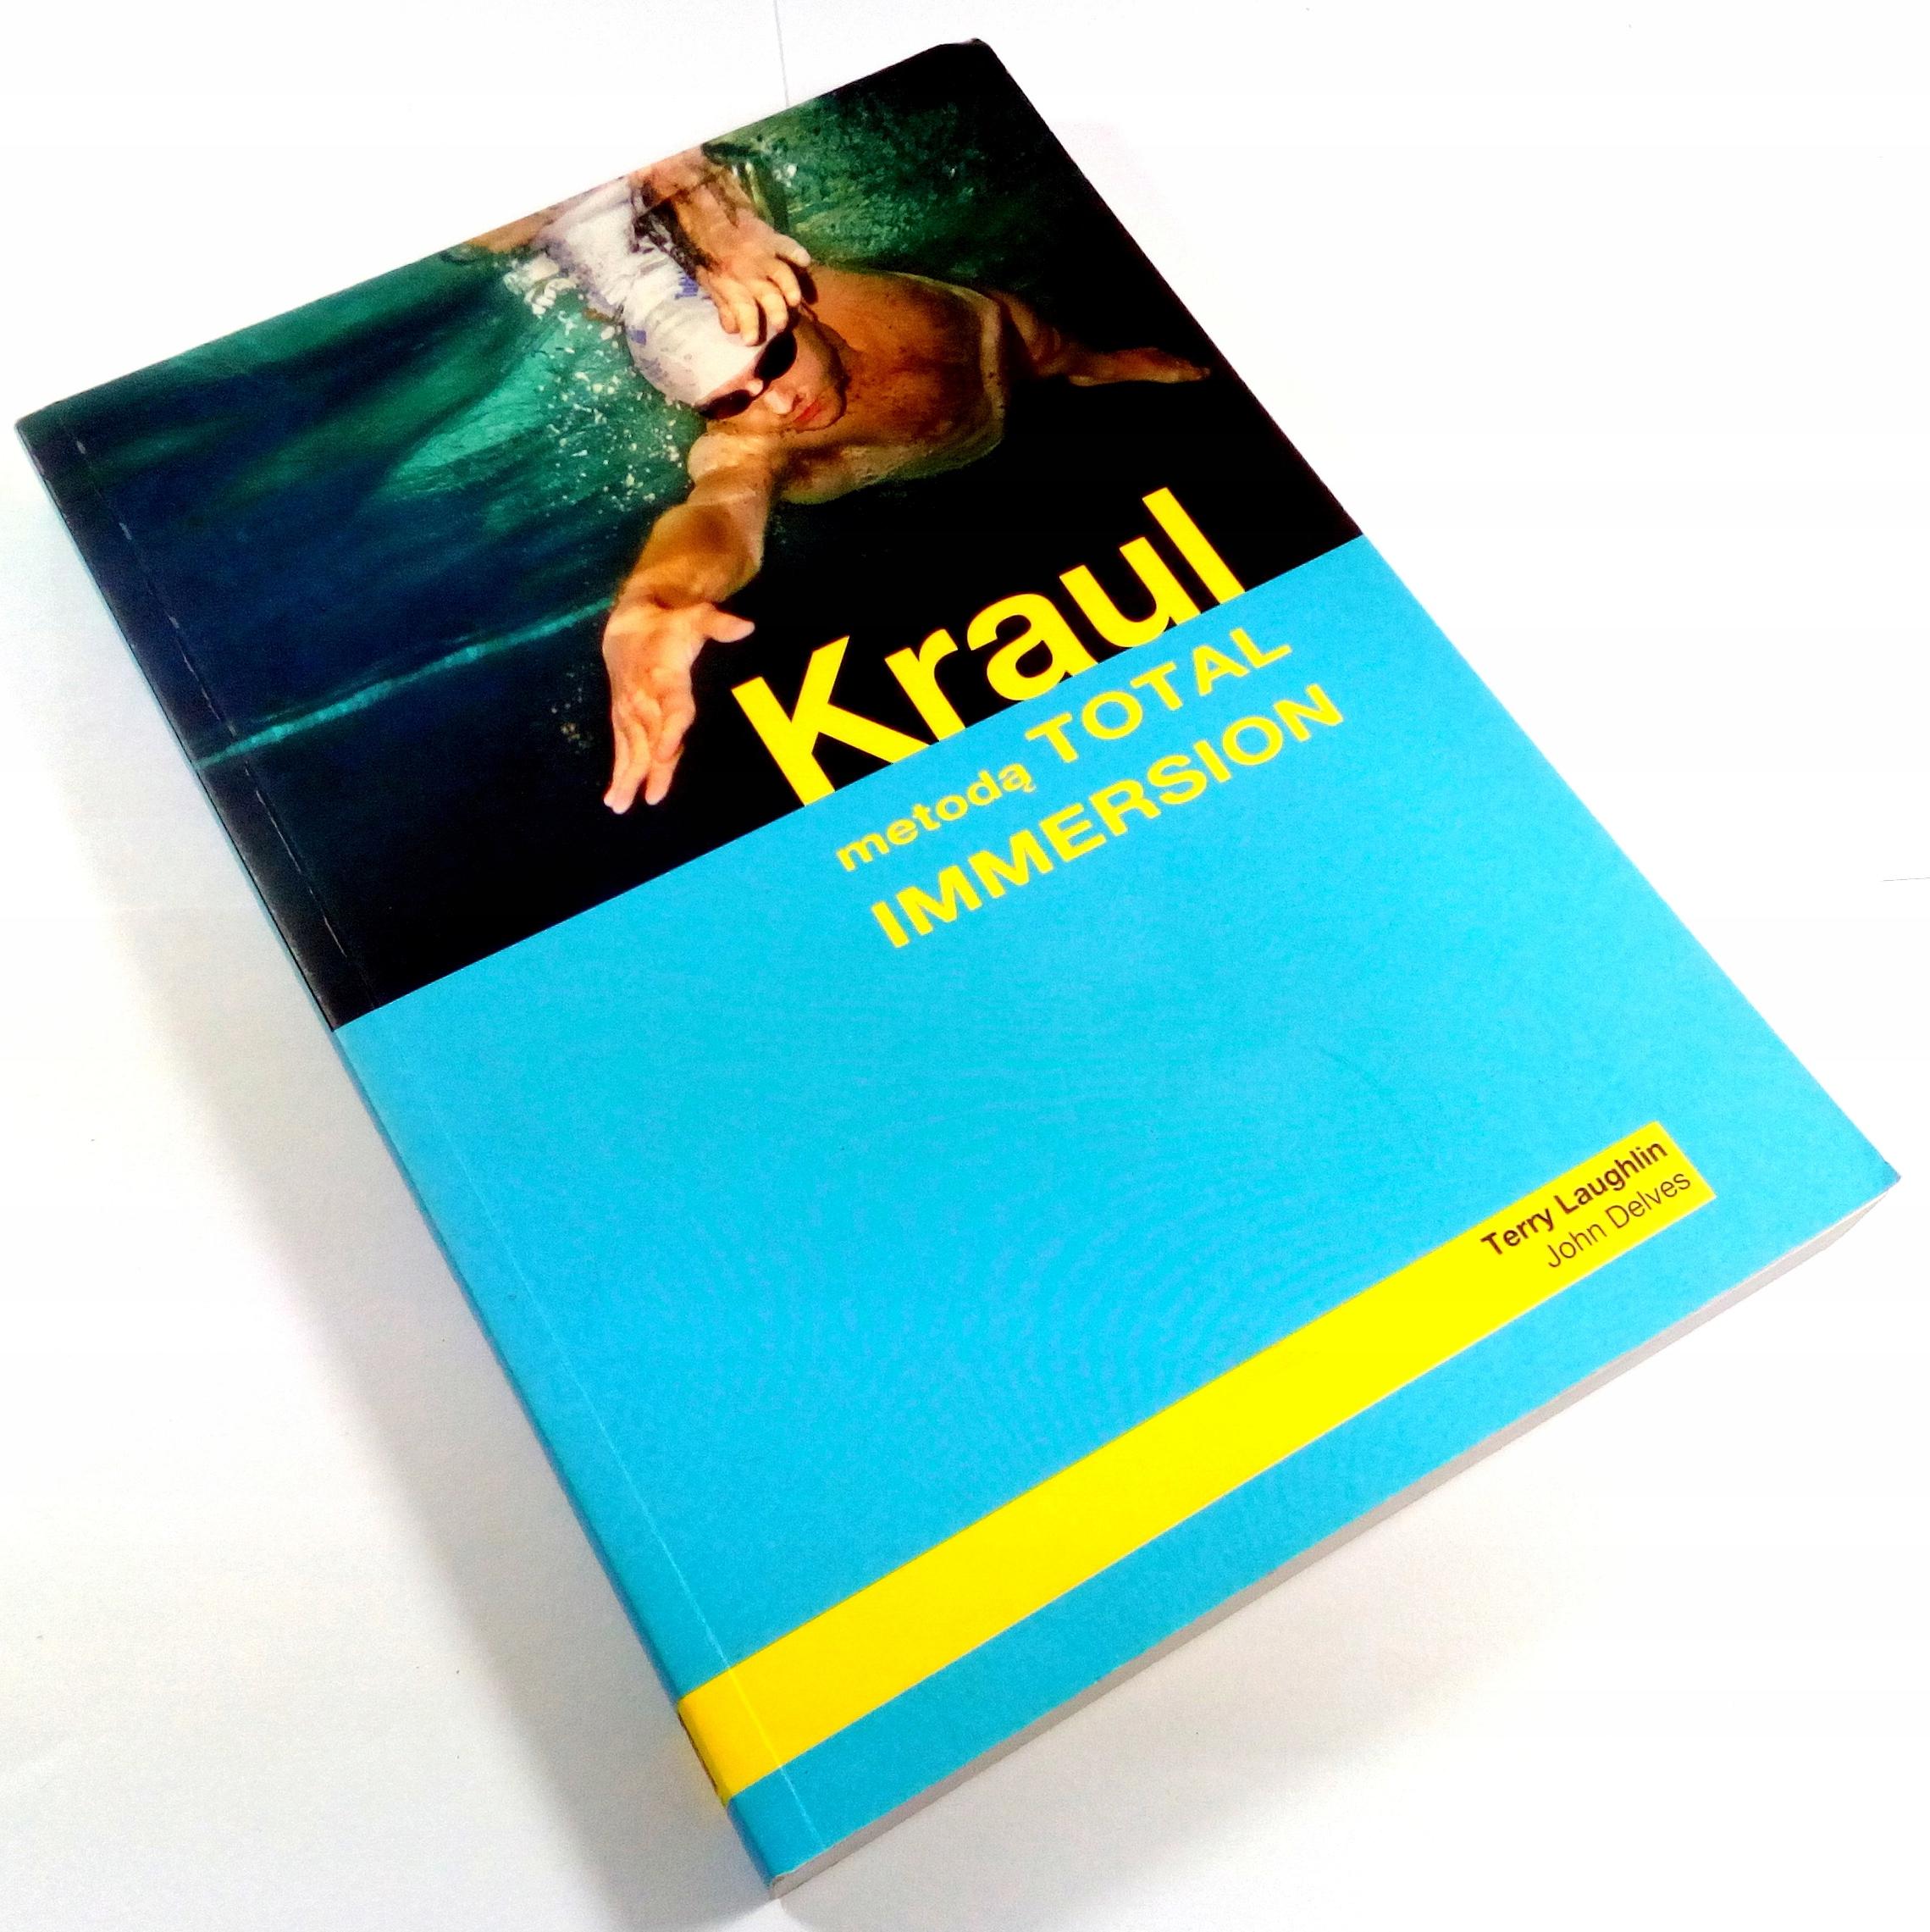 Laughlin T. - Kraul metodą Total Immersion